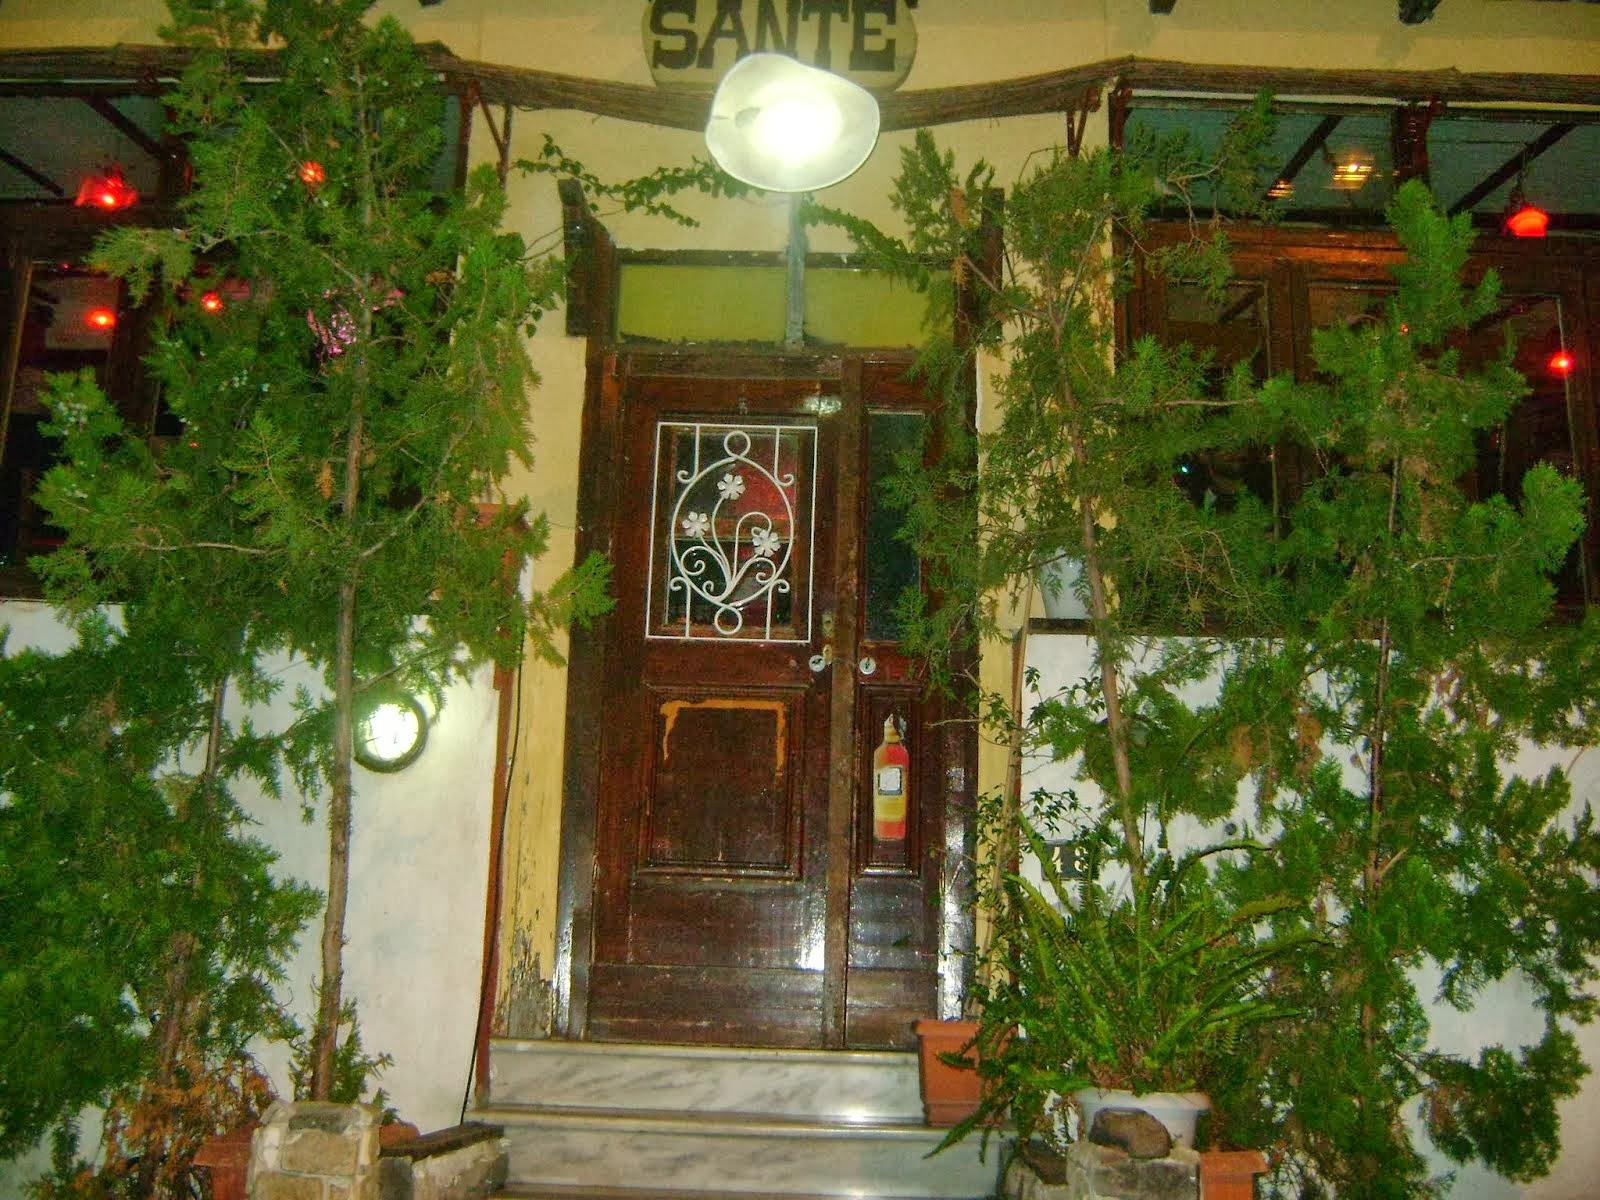 Sante Bar Athens !!!